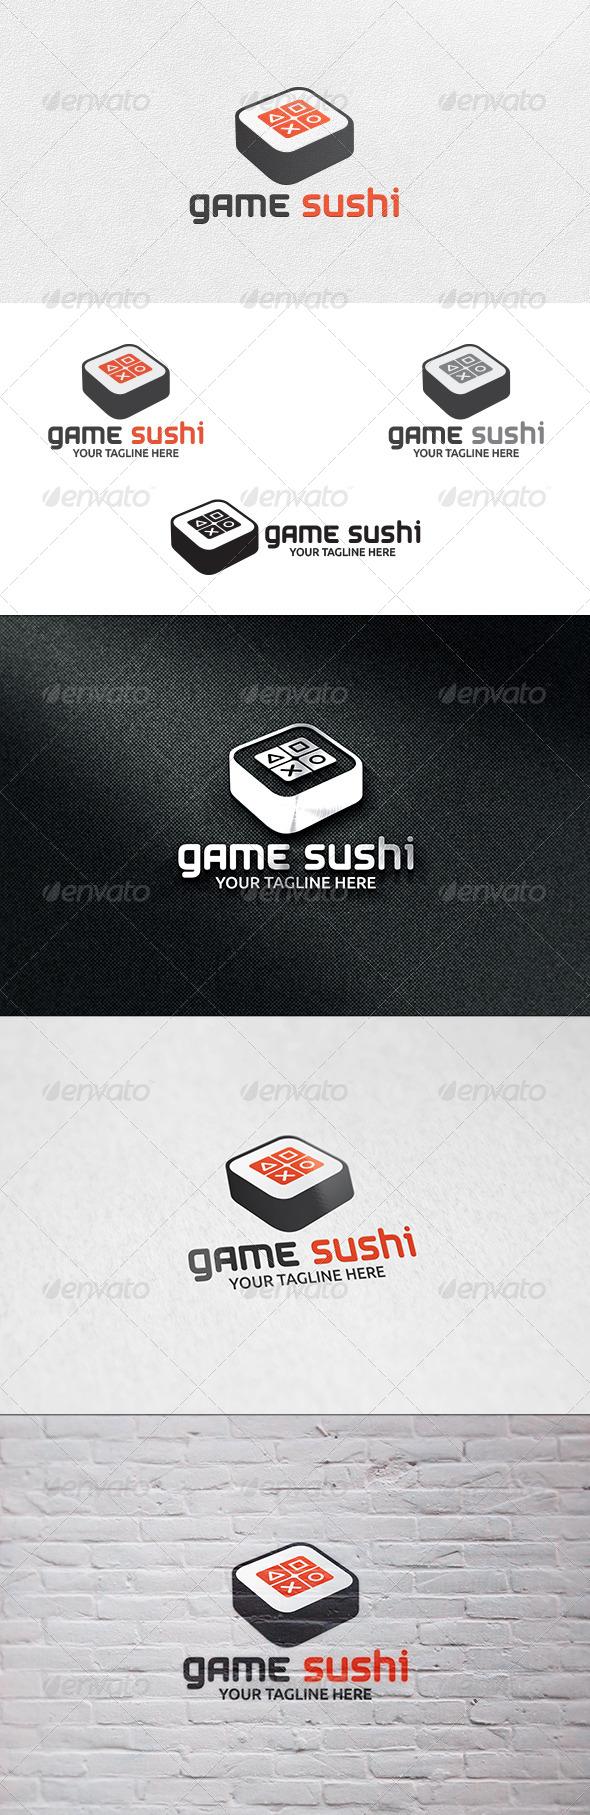 GraphicRiver Game Sushi Logo Template 7101068